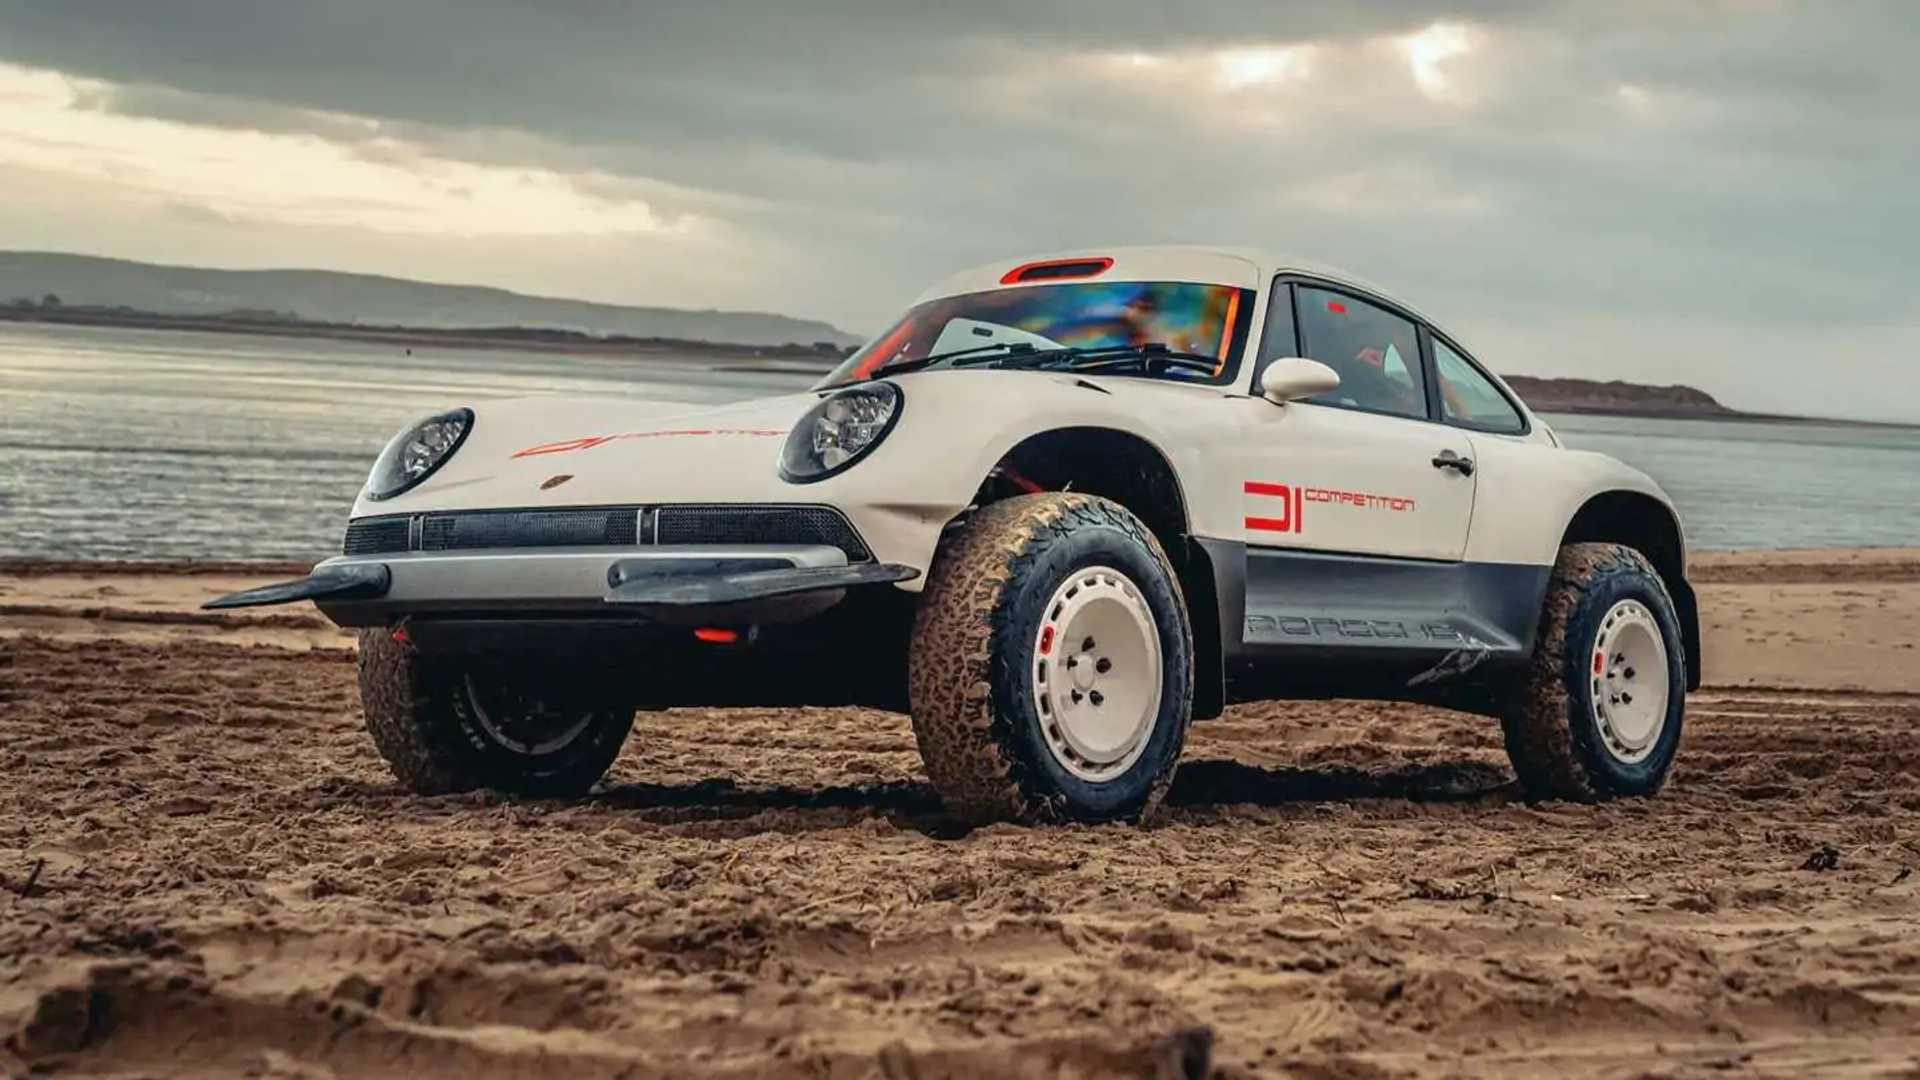 Singer All-Terrain Competition Study Porsche 911 Safari Nose Up Beach